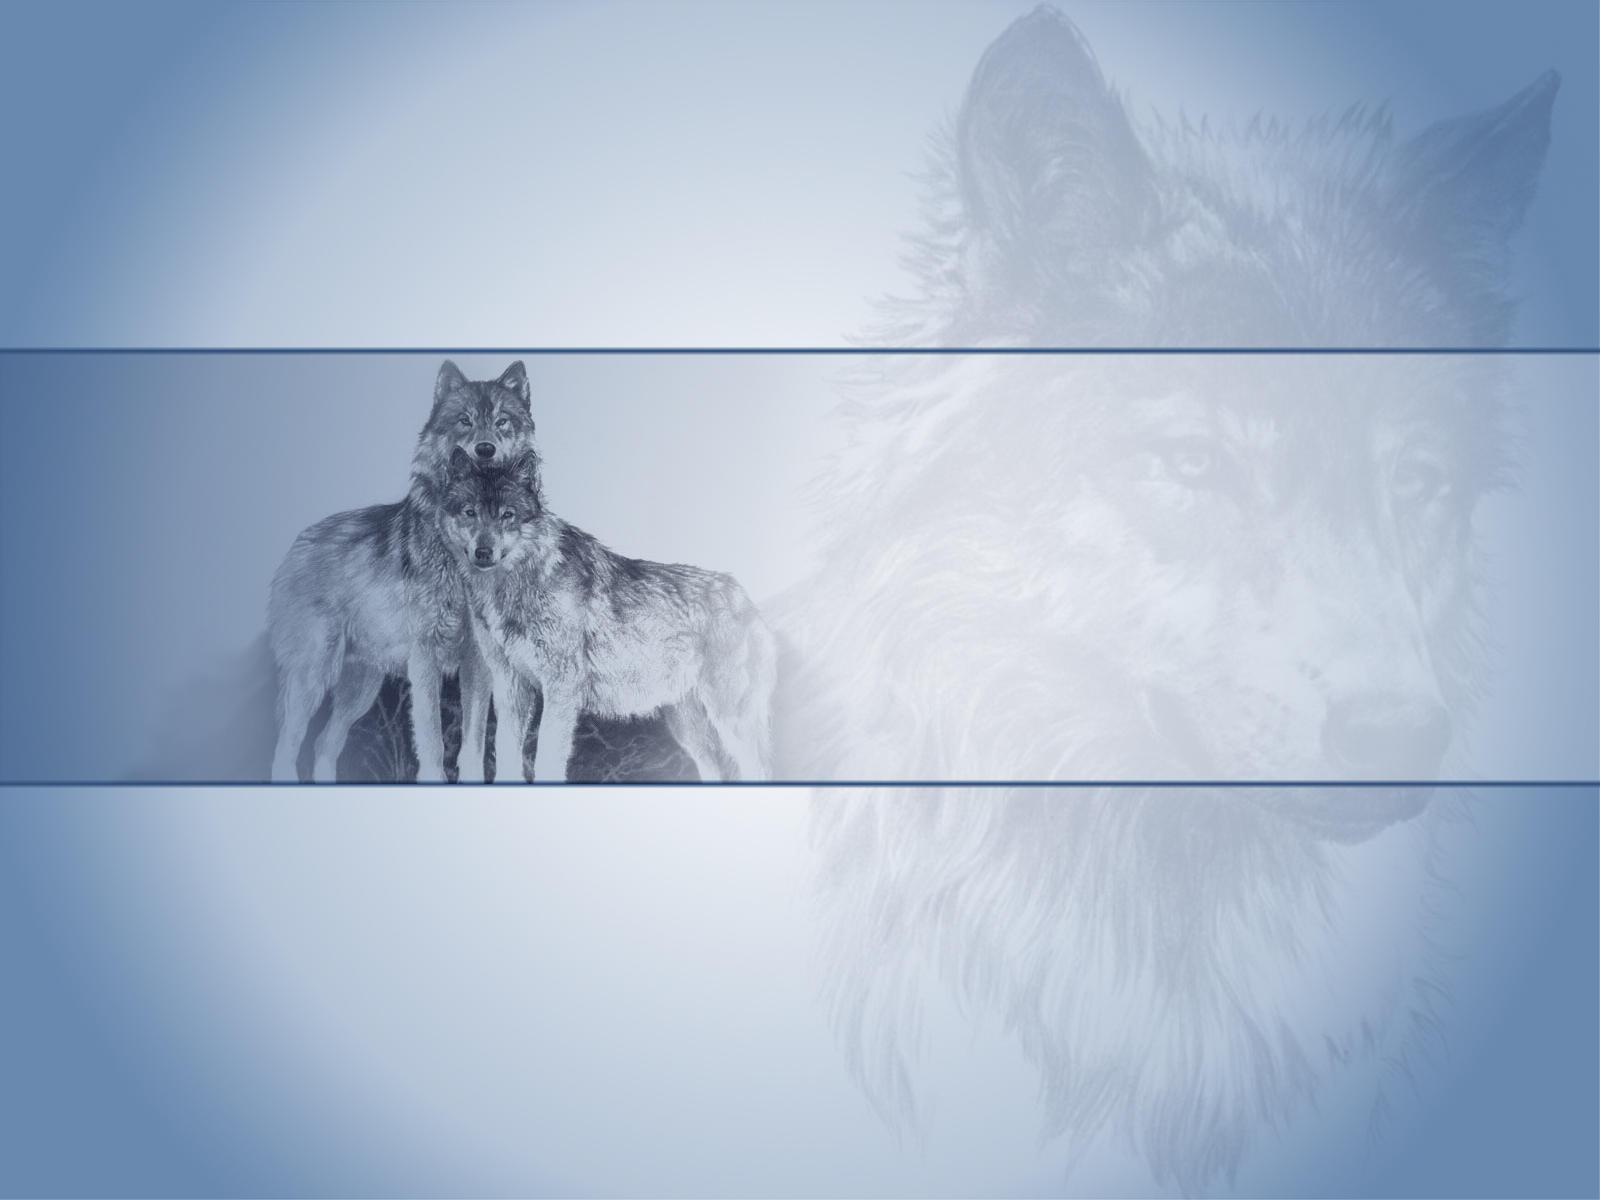 Wolfish by hopwoods